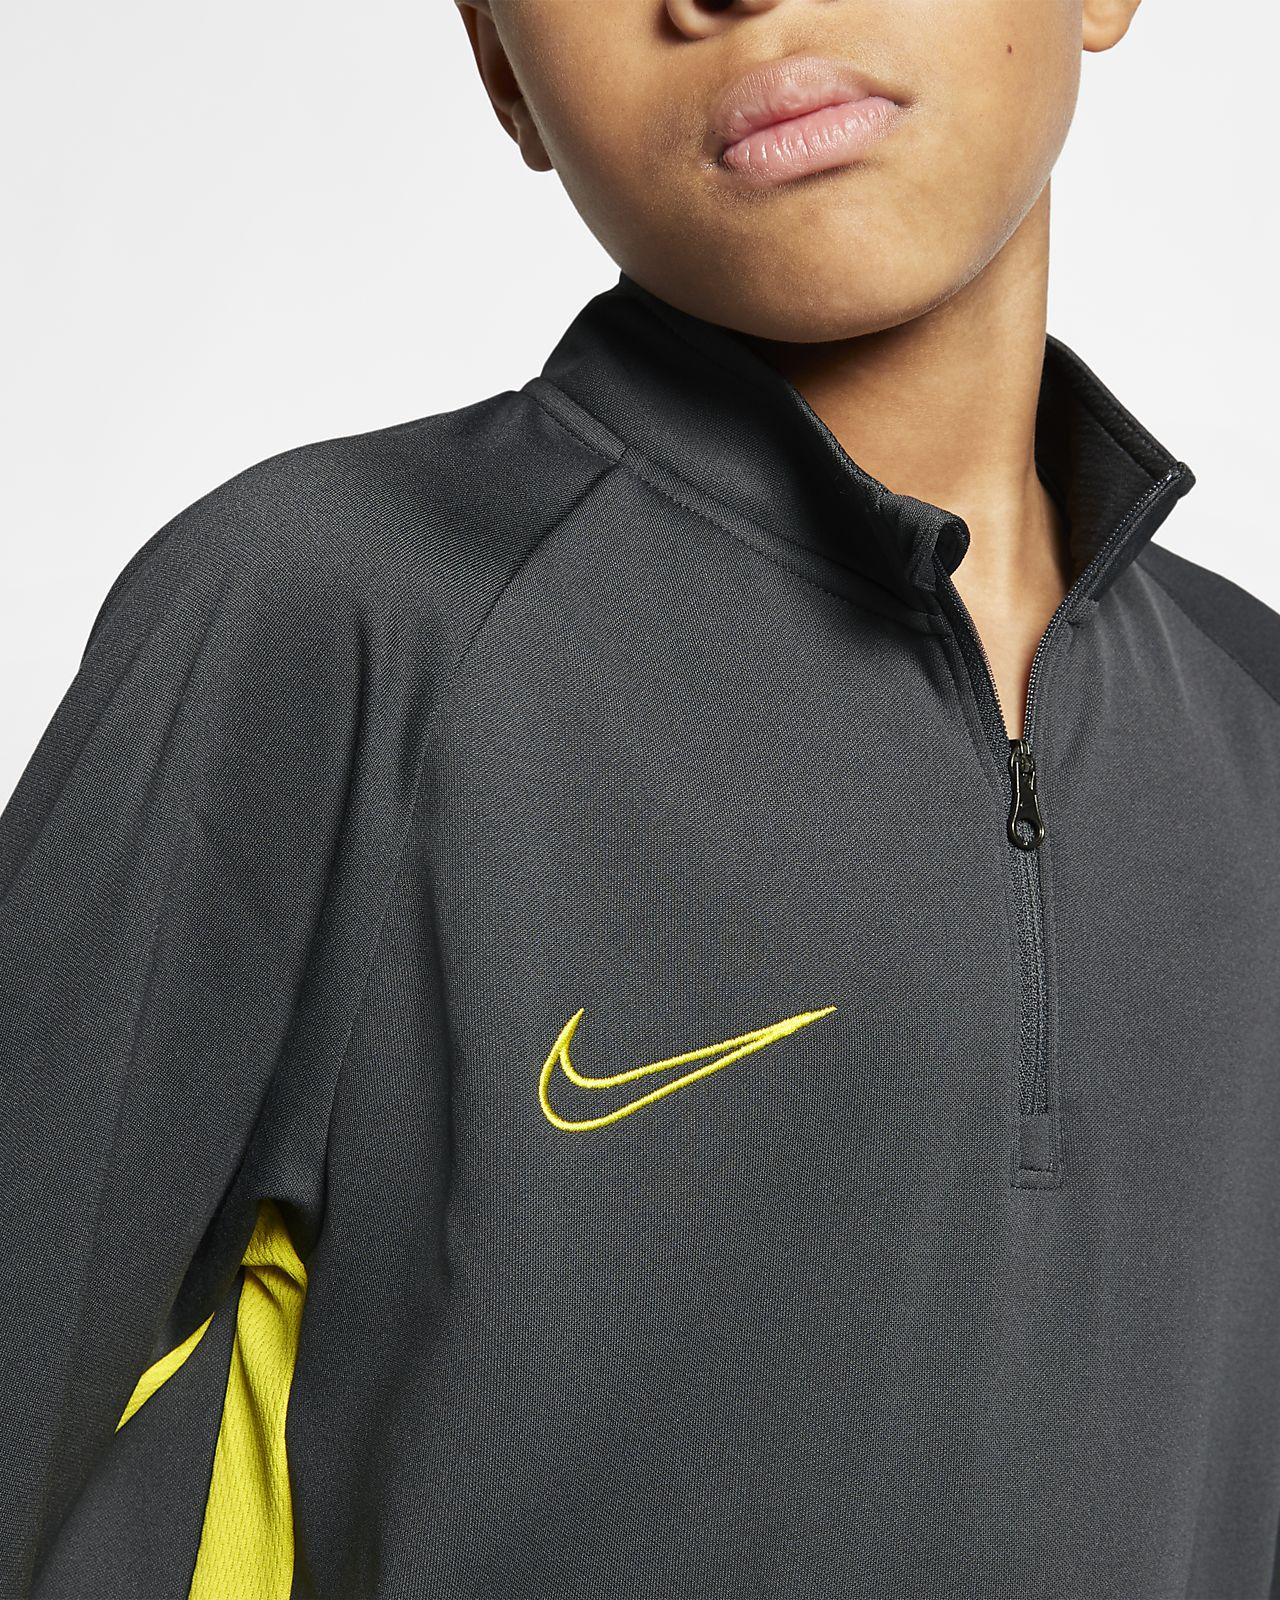 e5a9a9ca3 Nike Dri-FIT Academy Older Kids' Football Drill Top. Nike.com SE